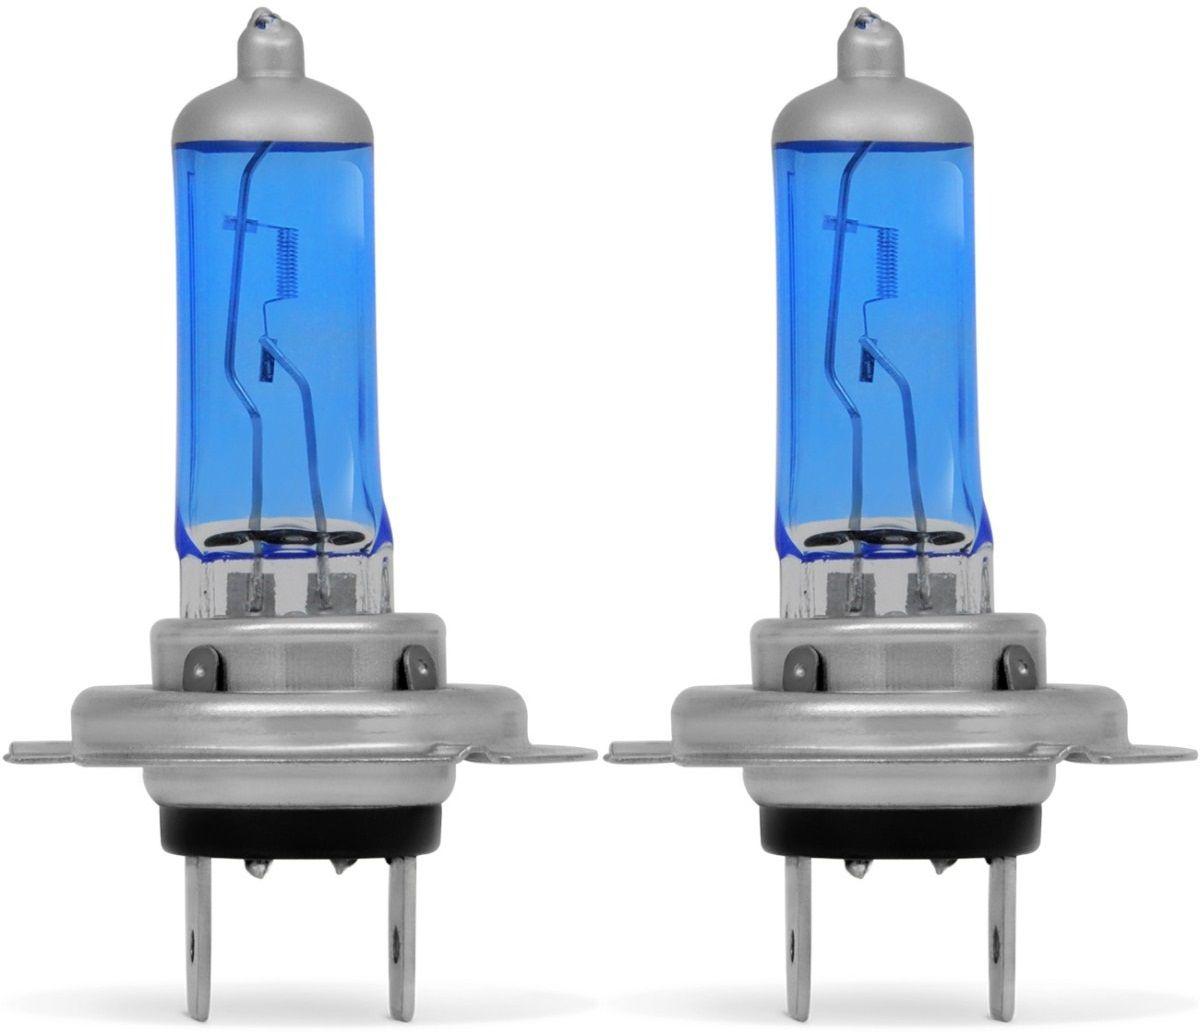 Par Lampada H7 Super Branca 12v 55w Xenon Similar A Philips